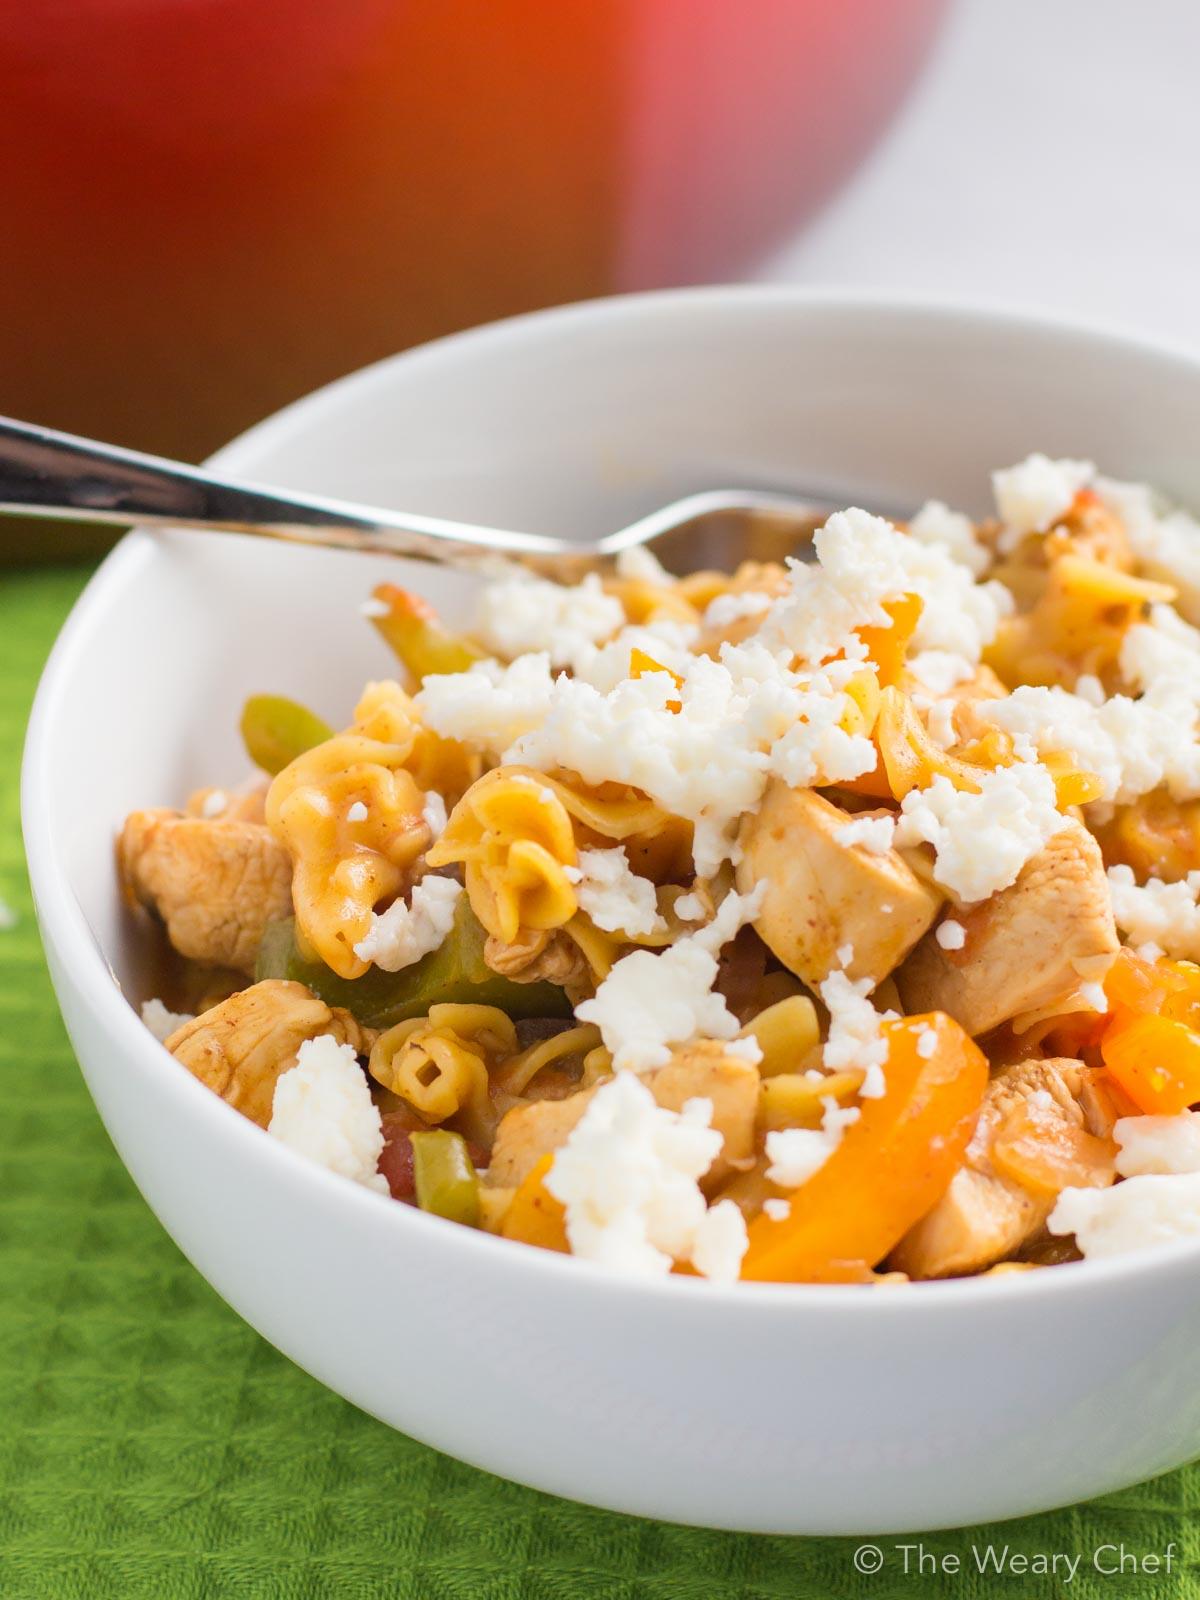 Get the taste of fajitas in this easy, one-pot chicken pasta recipe!